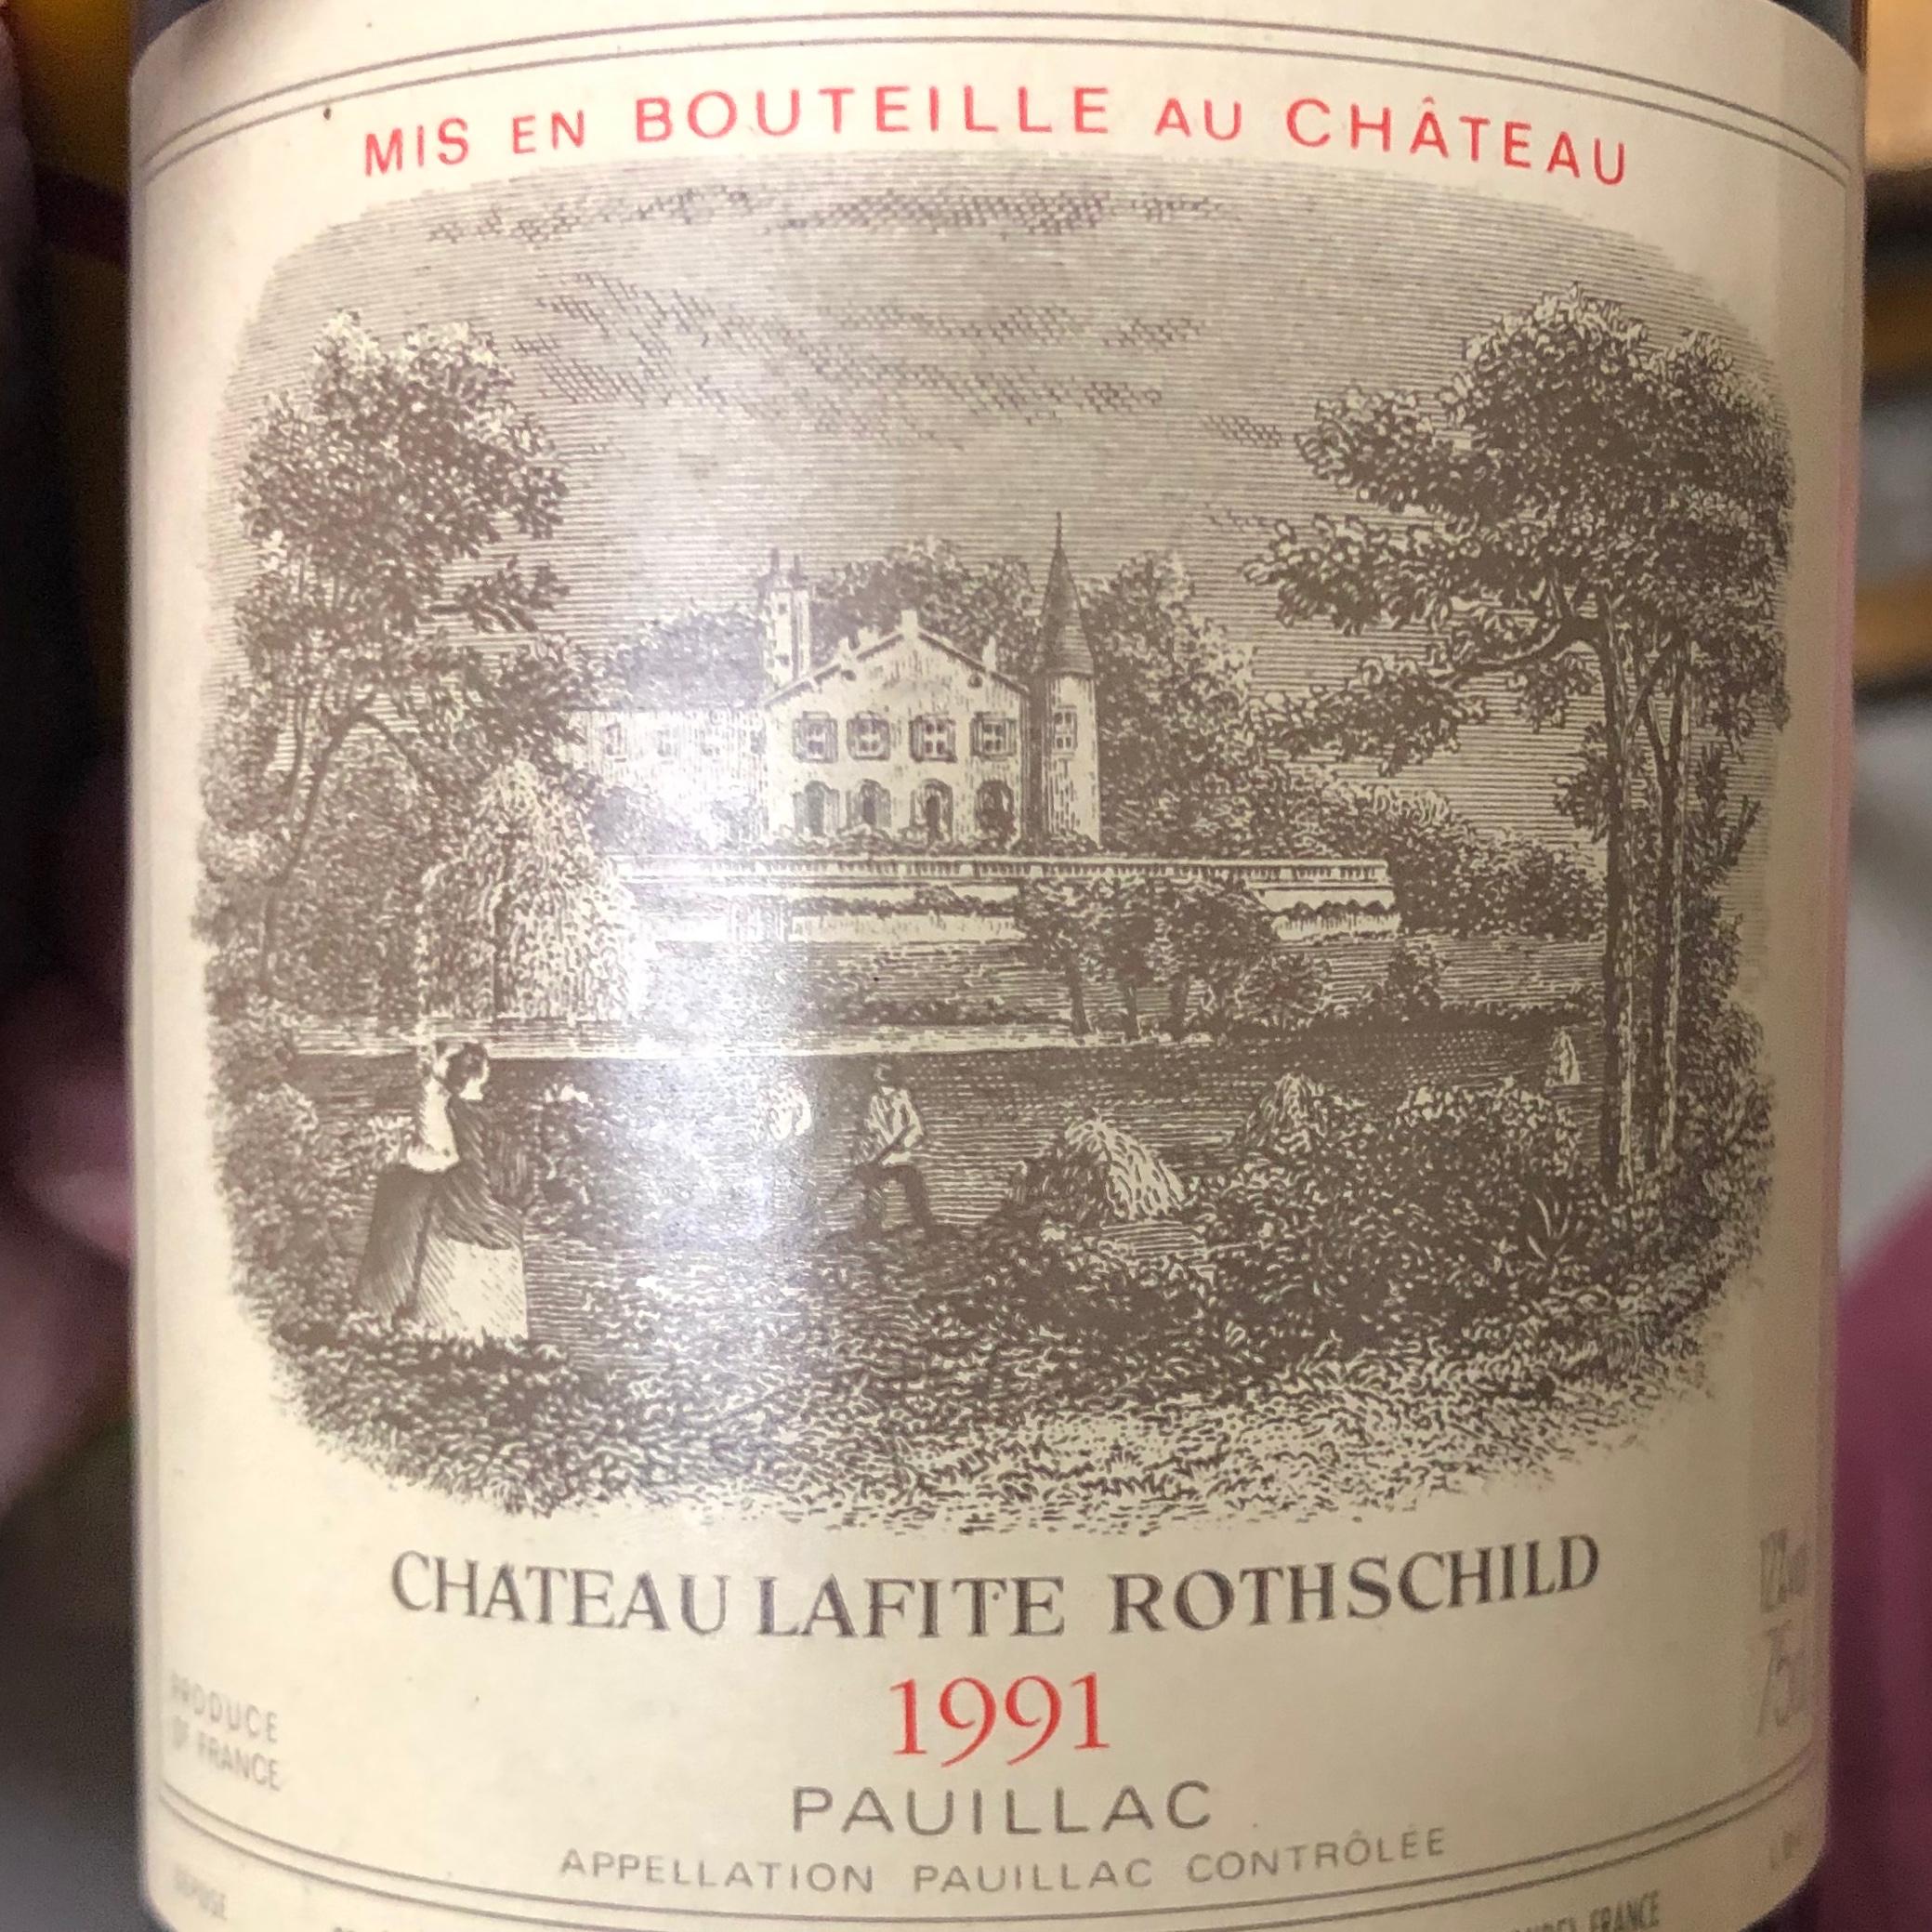 Chateau Lafite Rothschild Jg. 1991